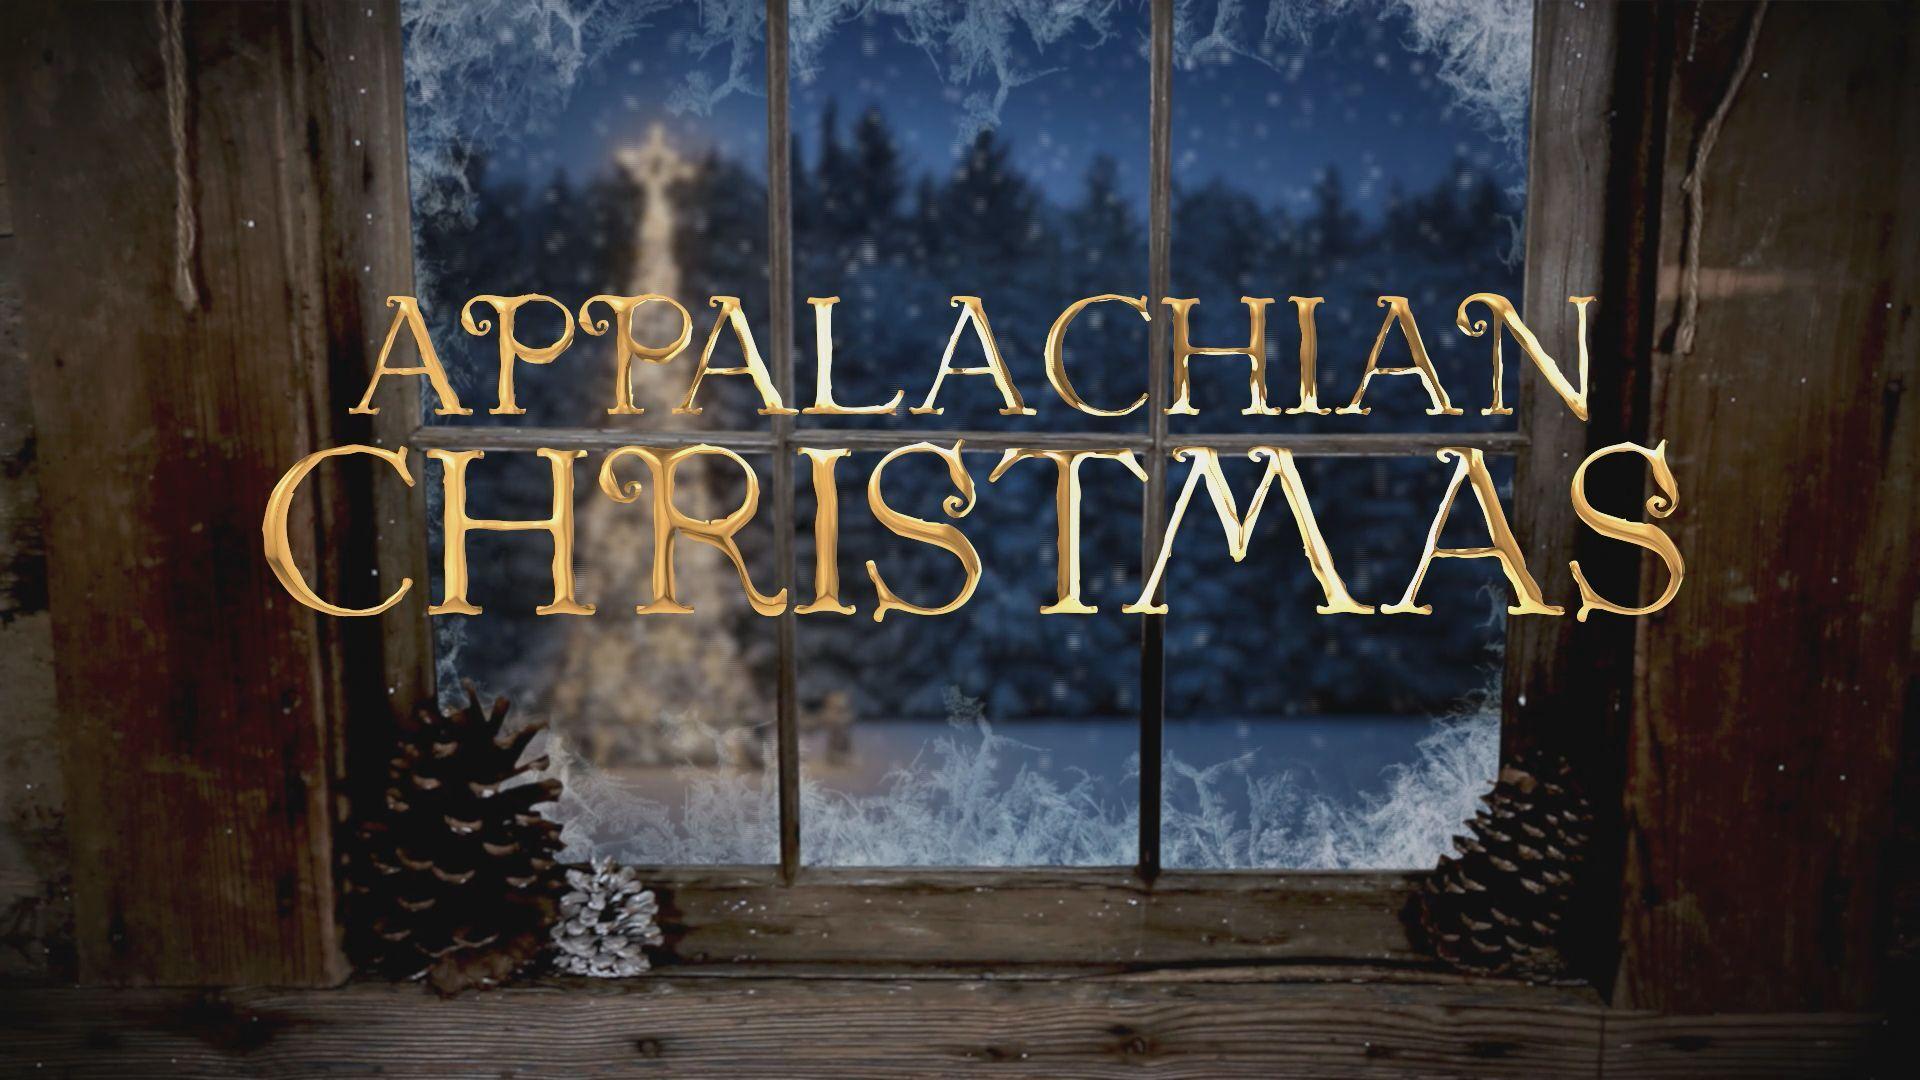 Appalachian Christmas | wbir.com